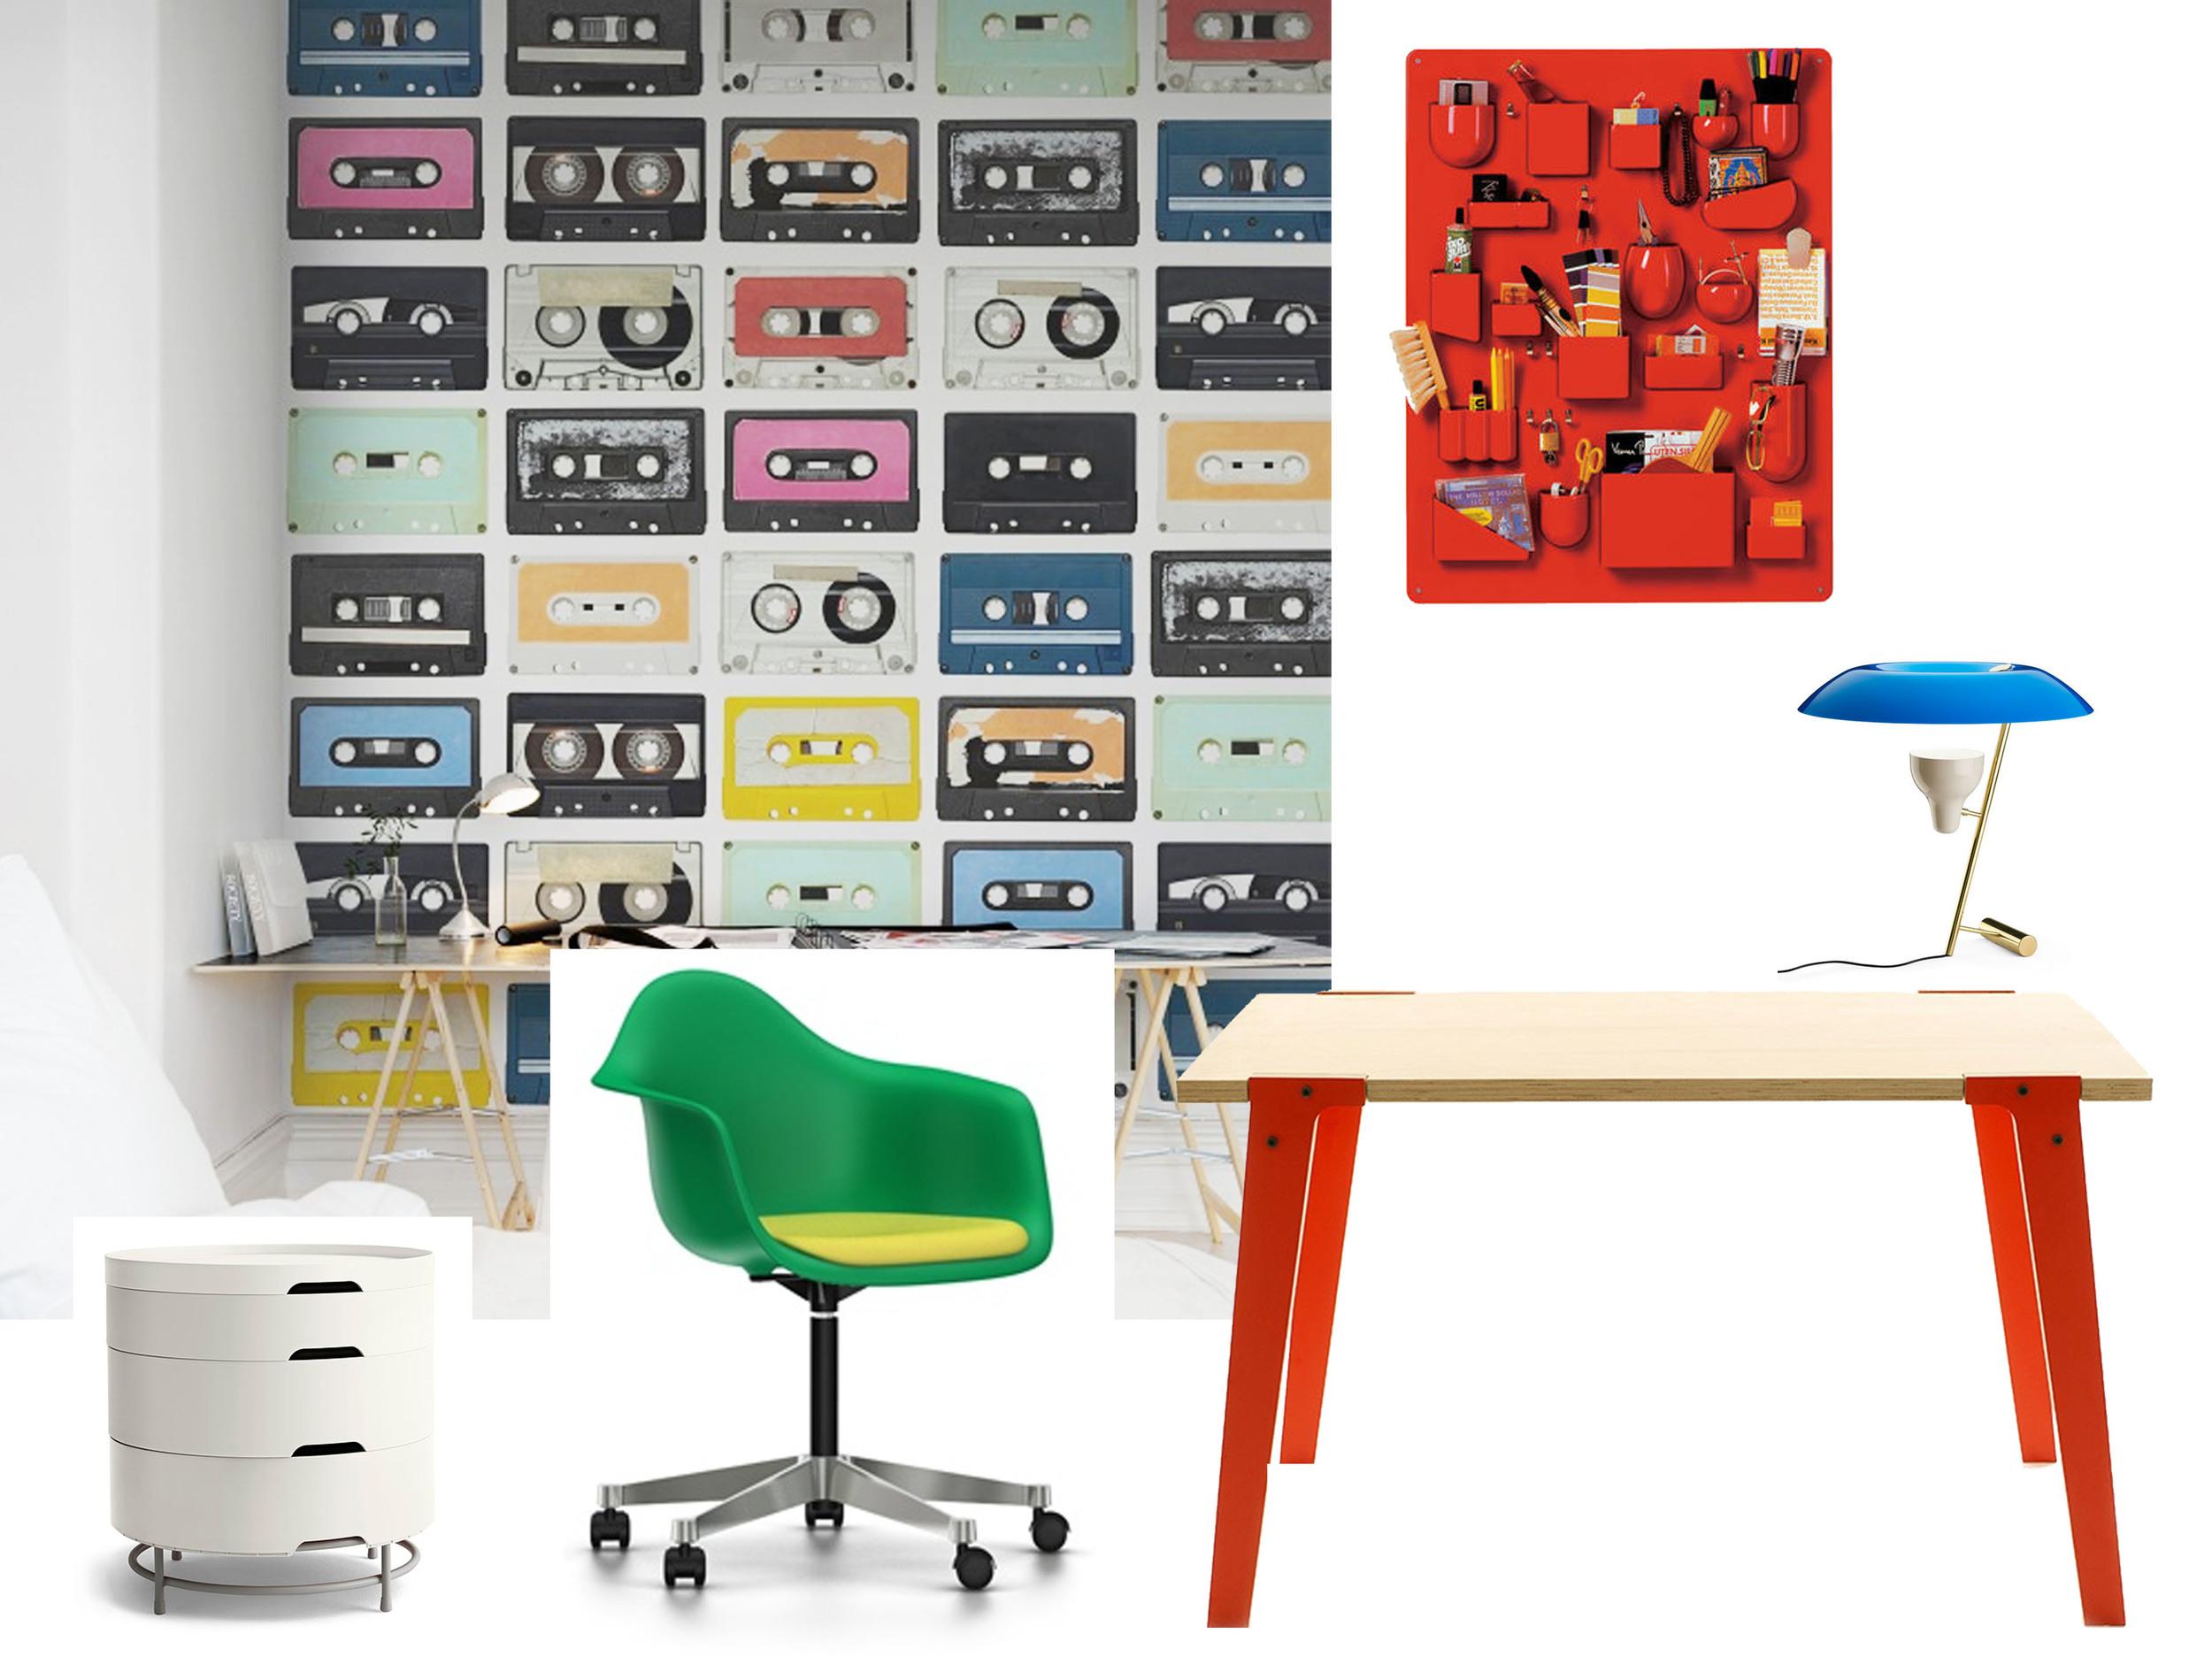 Eames chair  Vitra  - Switch desk  Rform  - desk lamp MOD. 548  Flos  - drawer unit  Ikea  - wallpaper Mixed Tape  Rebel Walls - wall organiser Uten.Silo  Vitra